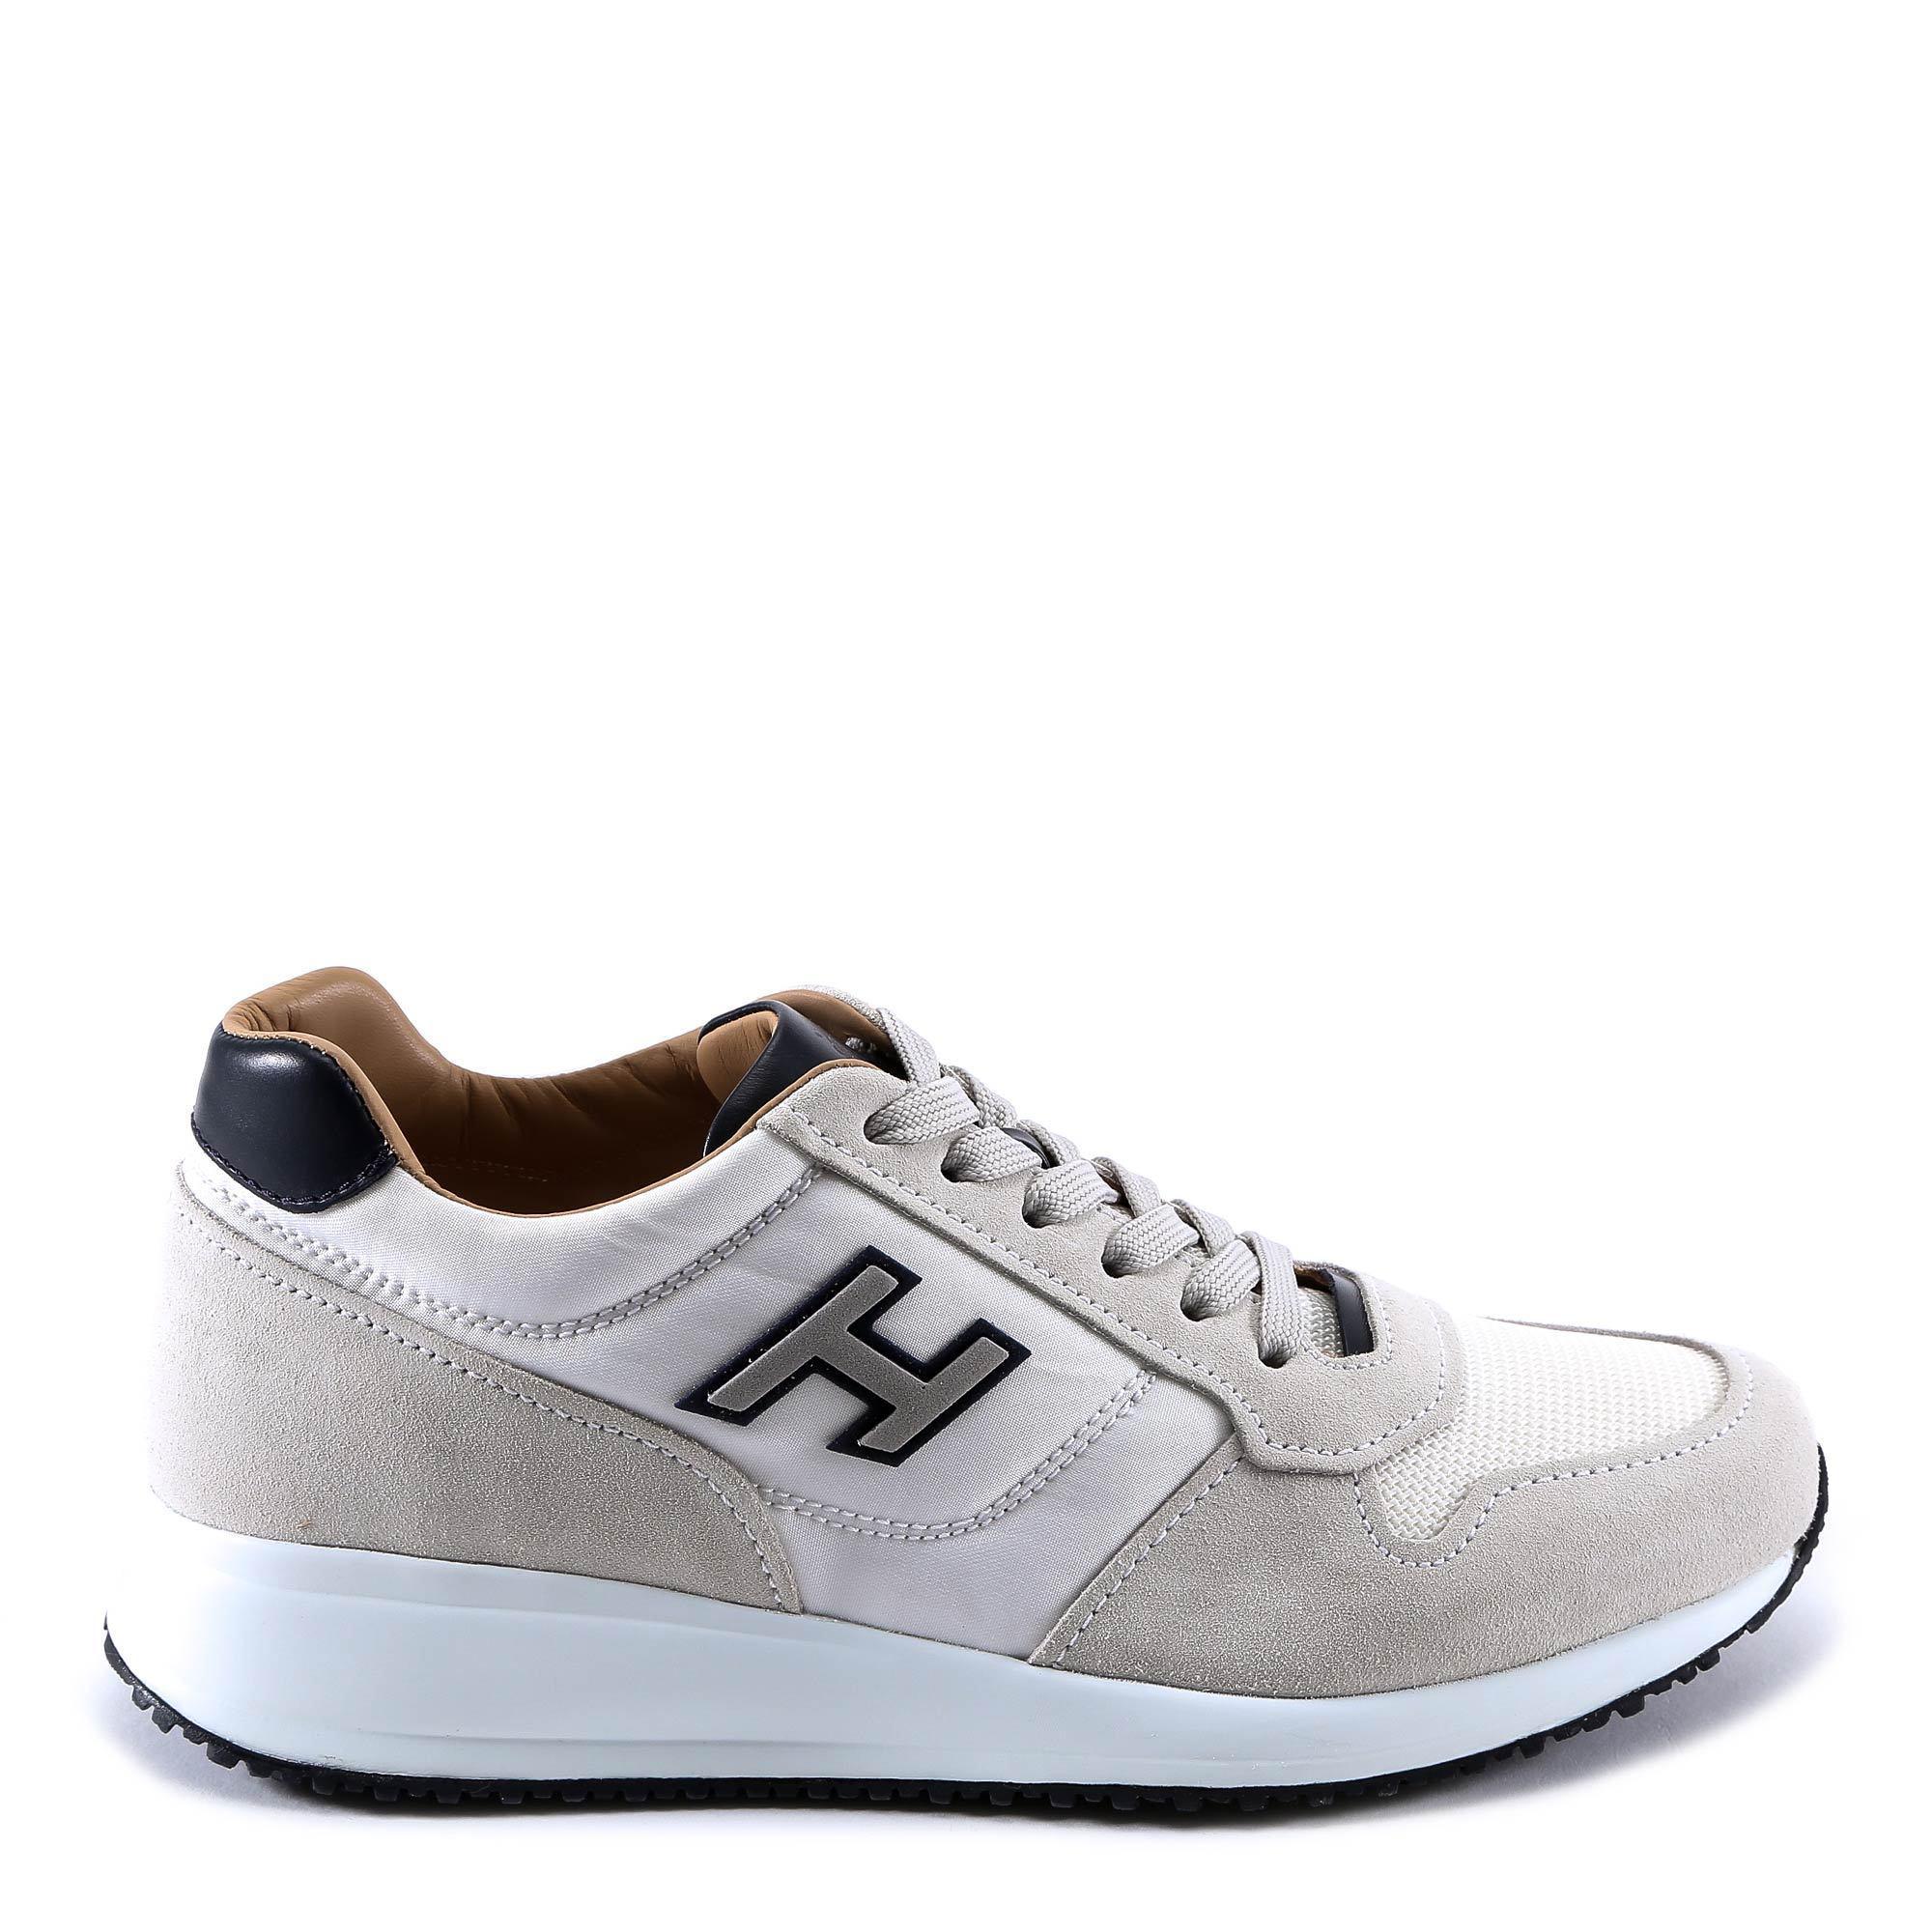 c7b8c019c65 Lyst - Hogan Interactive N20 Sneakers in White for Men